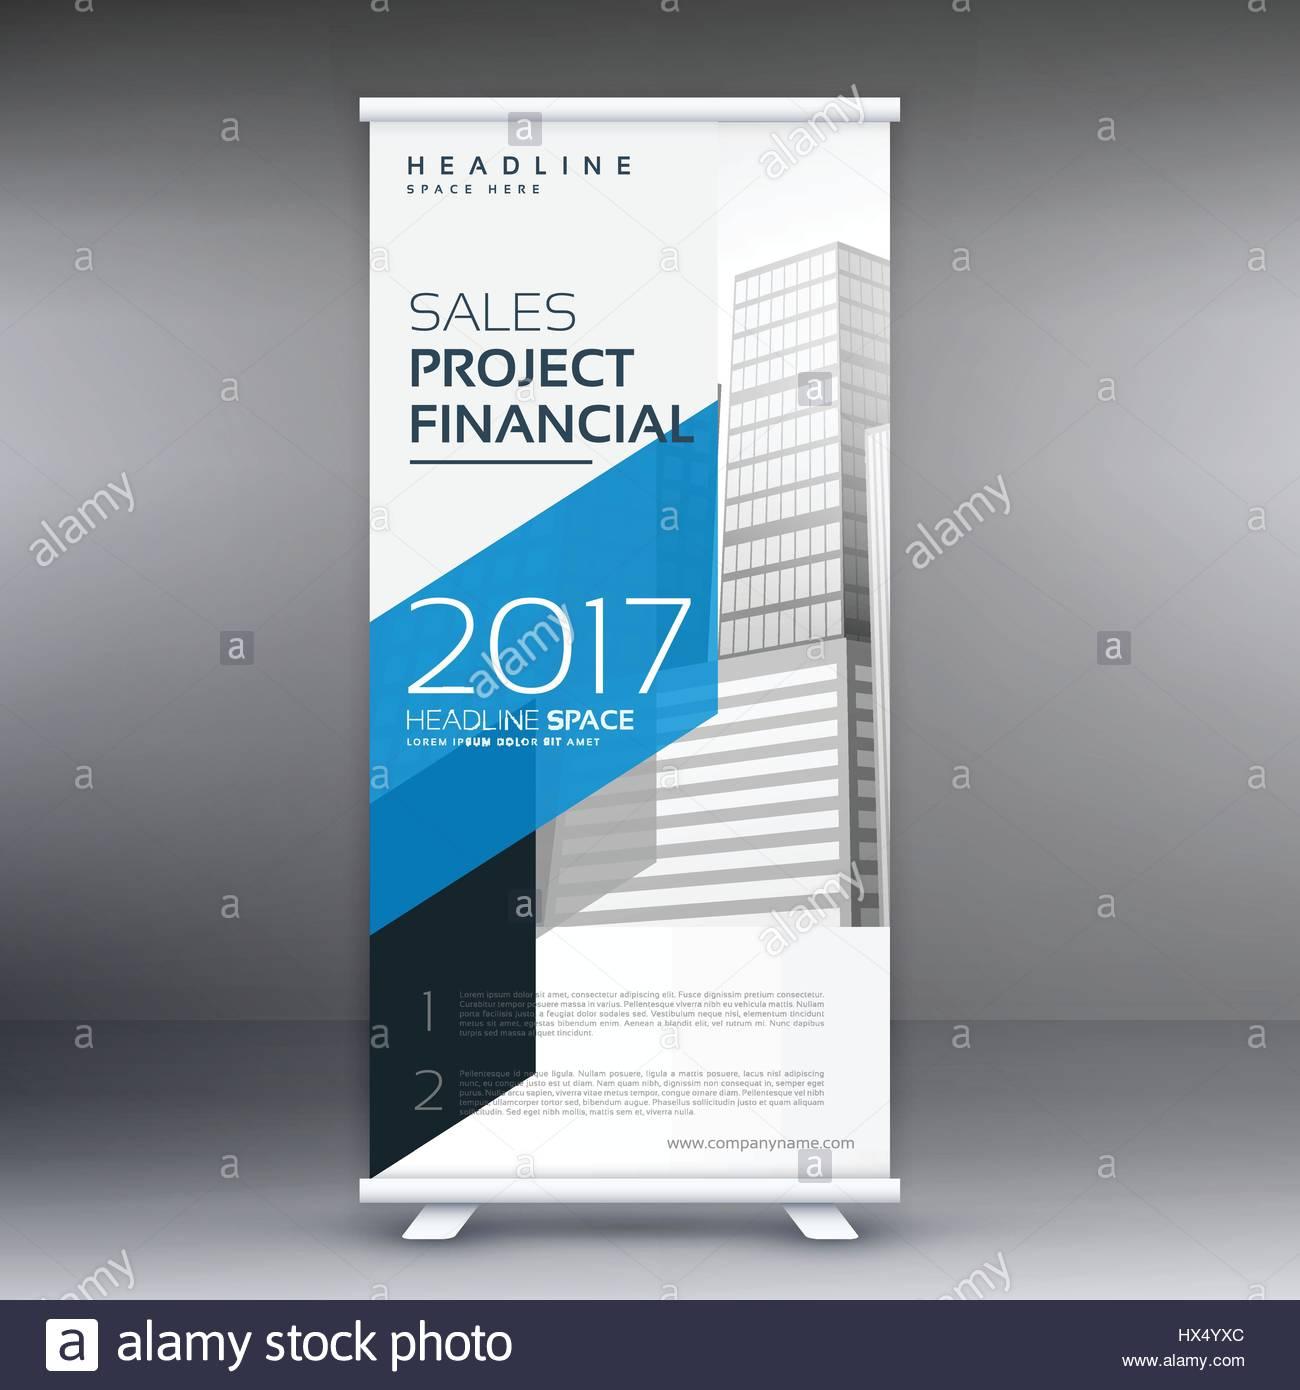 Company Brochure Template In Minimal Stockfotos & Company Brochure ...